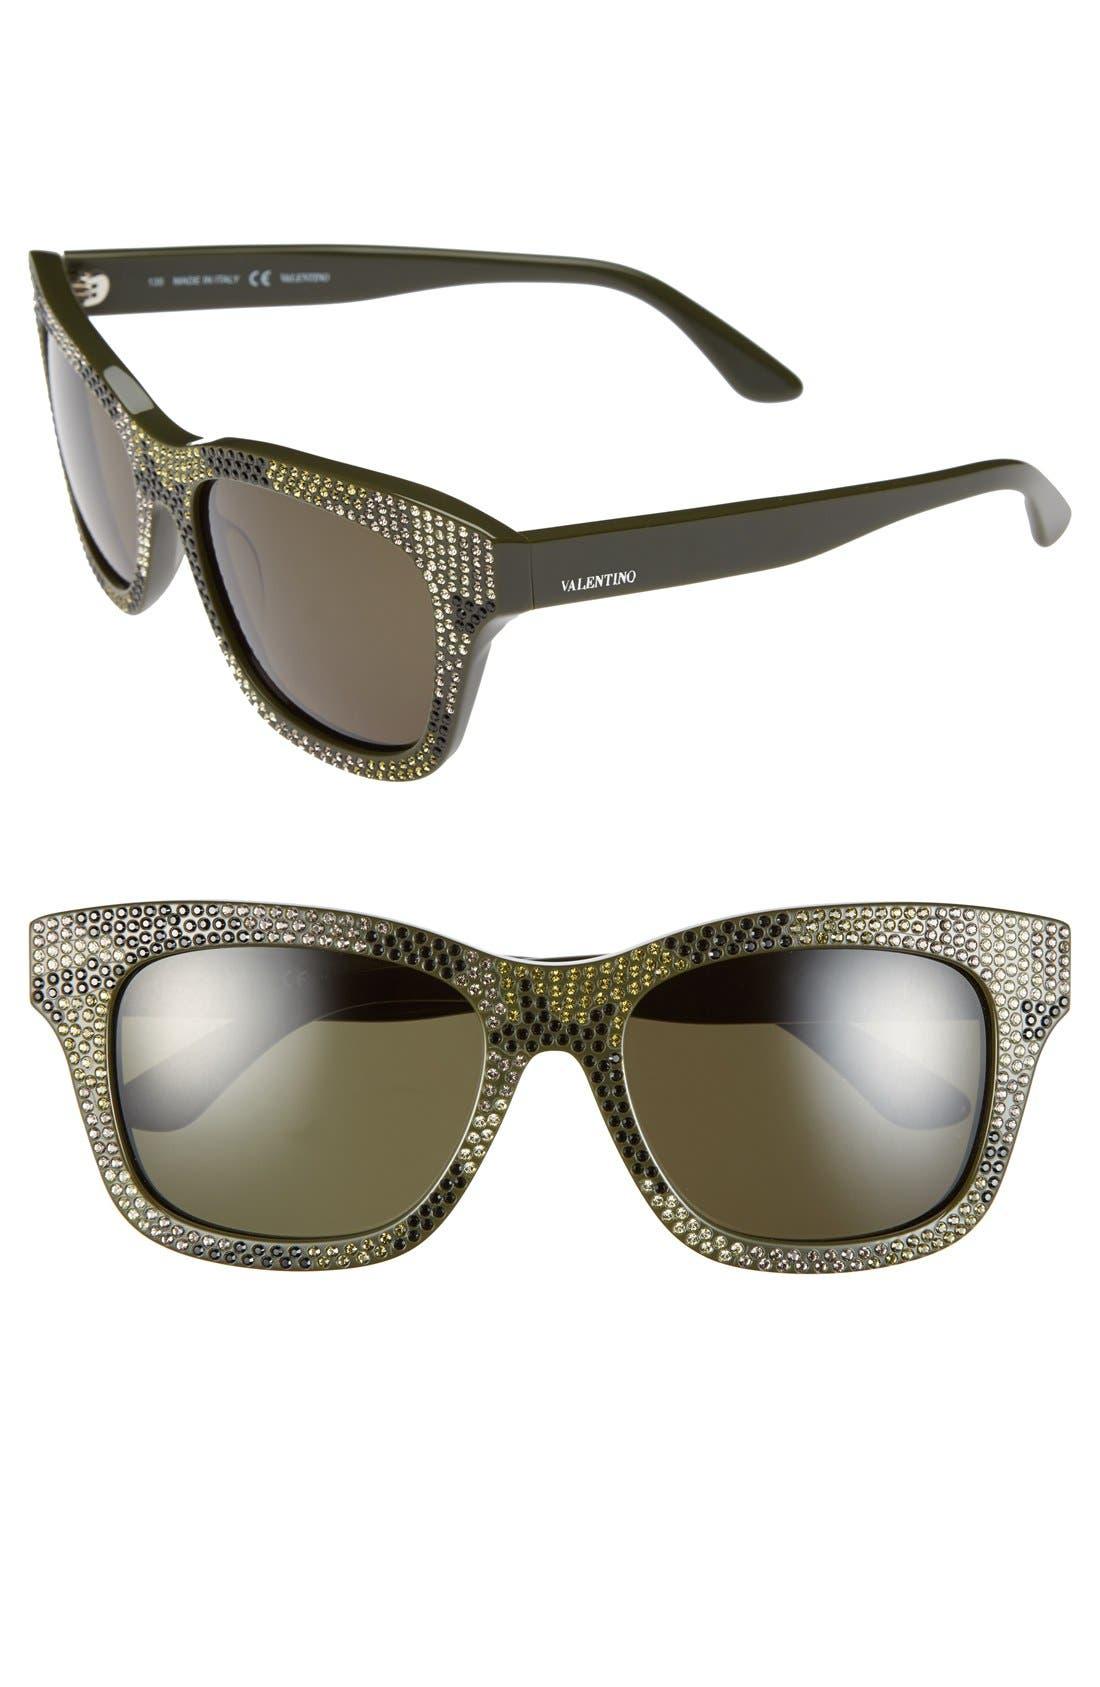 Main Image - Valentino 'Crystal Camo' 53mm Sunglasses